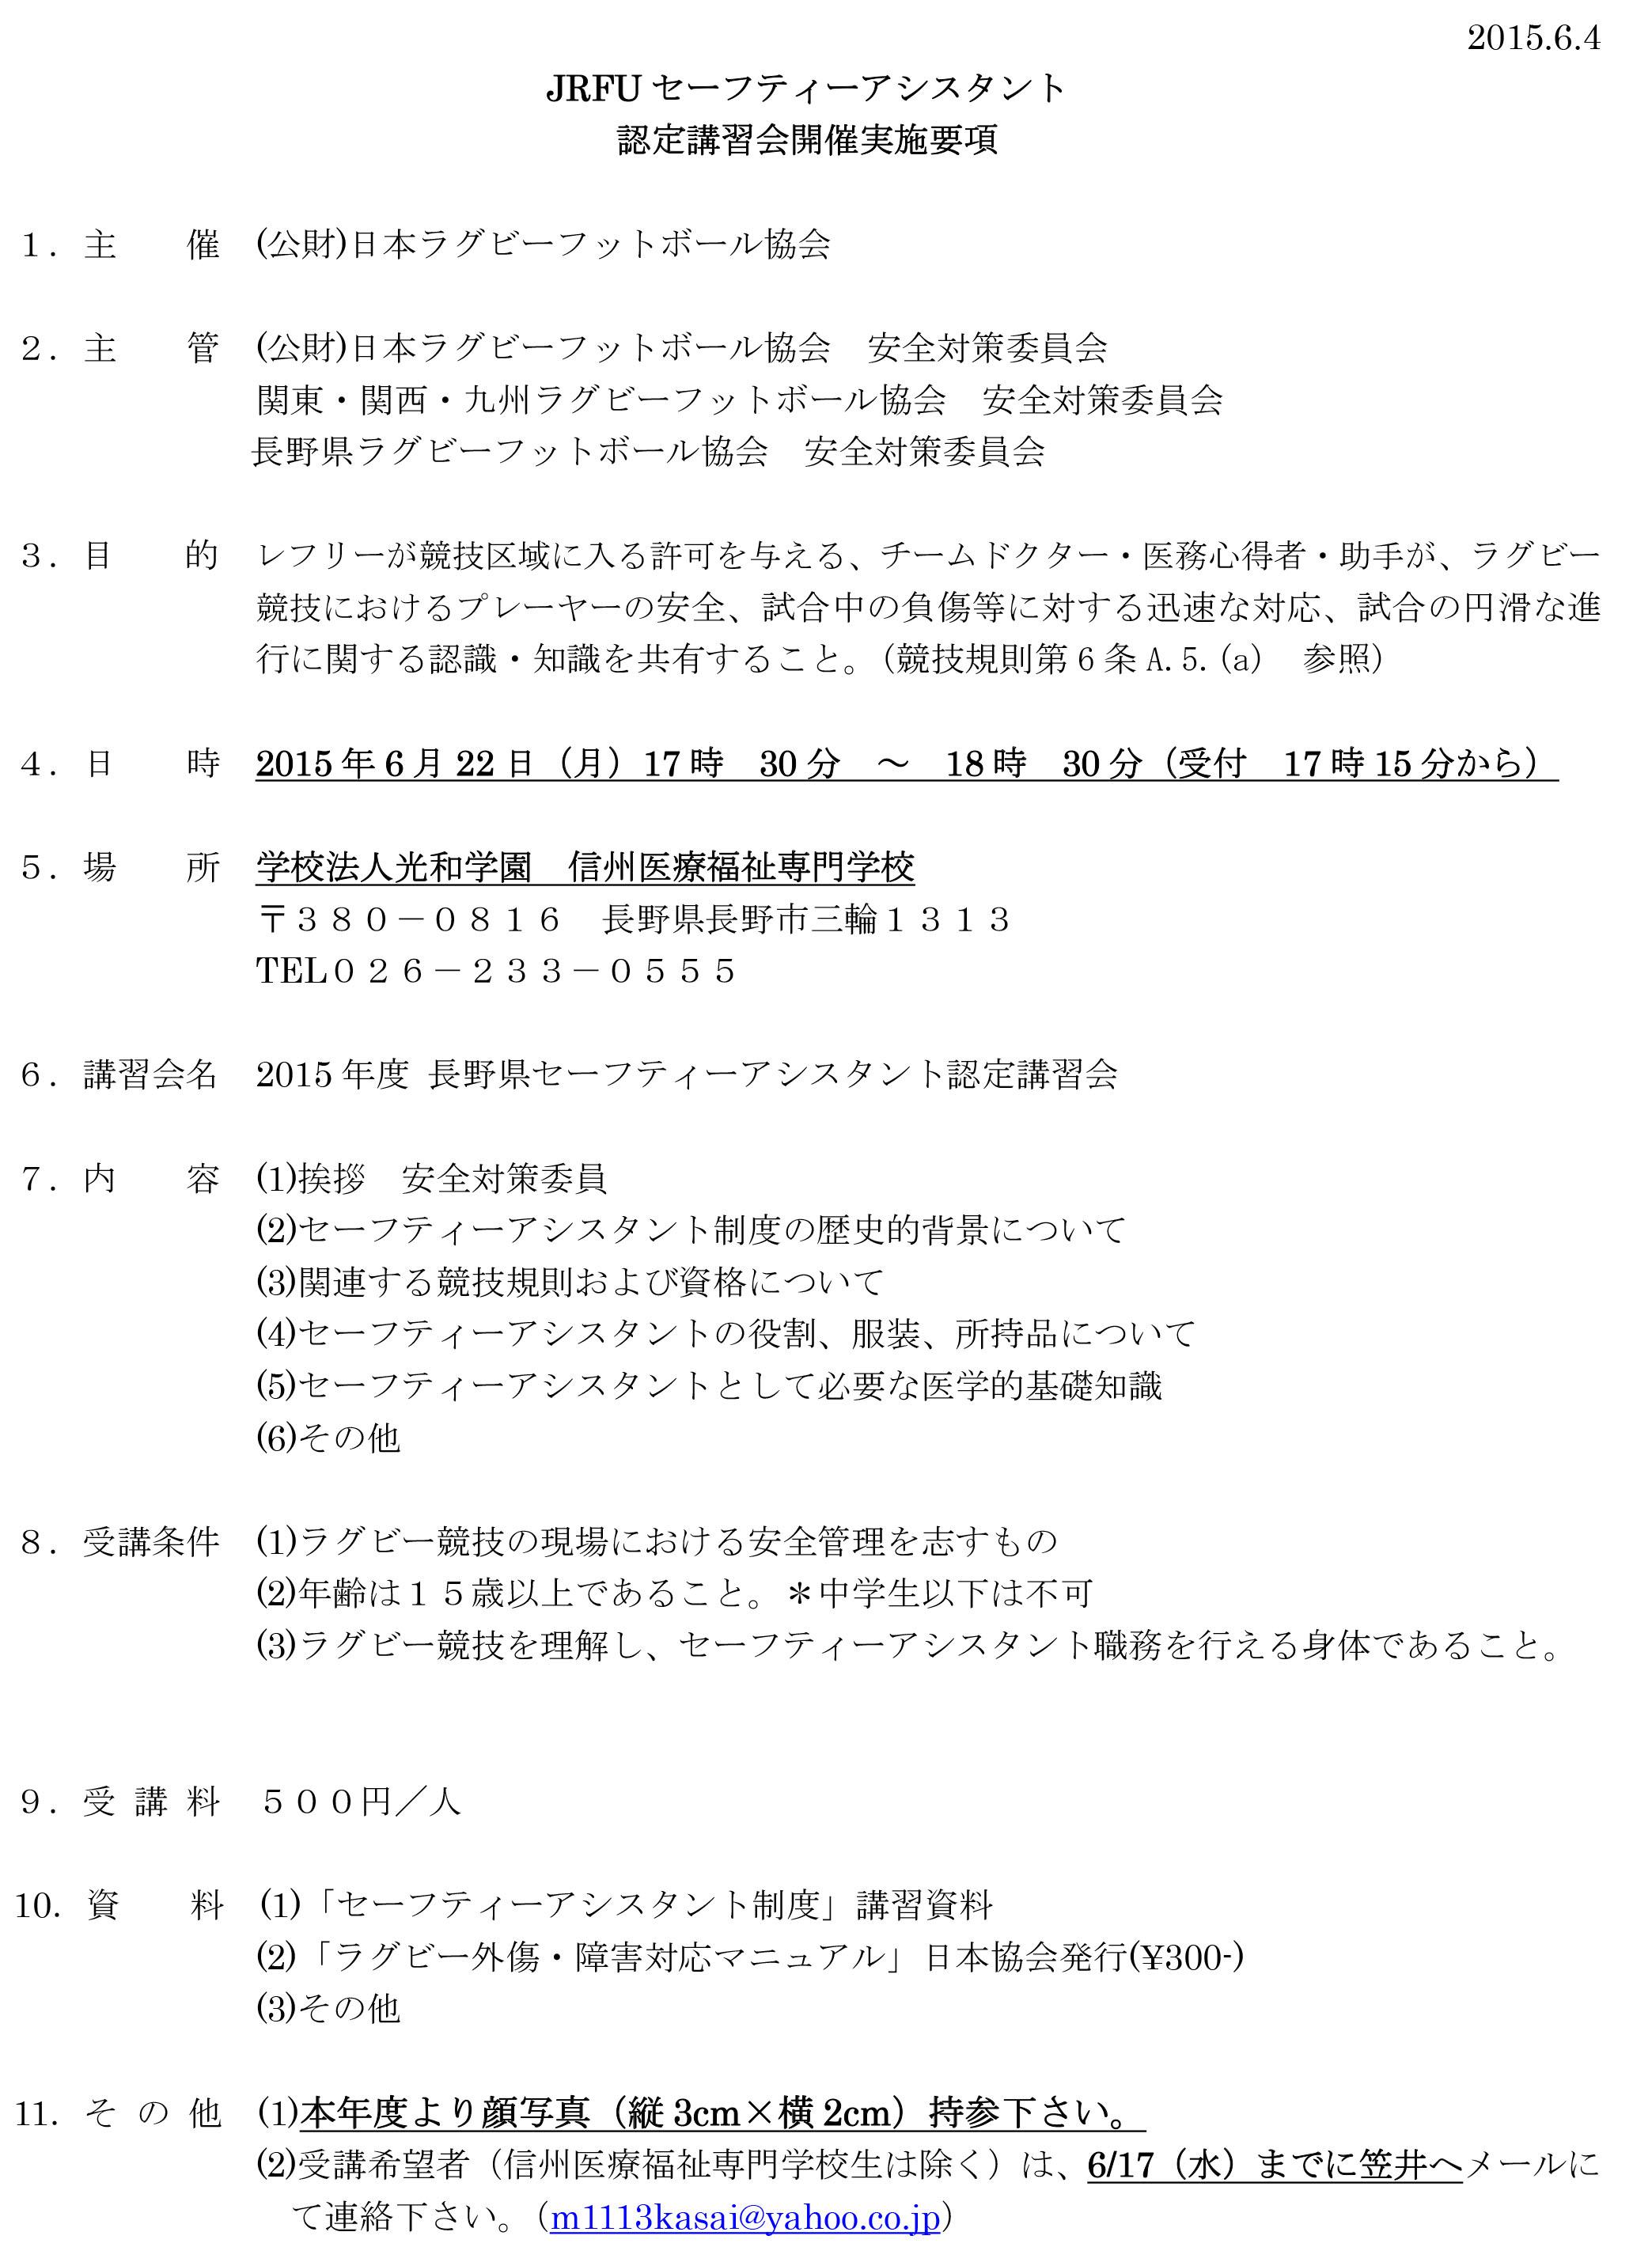 SafetyAssistant-Nagano20150622.jpg